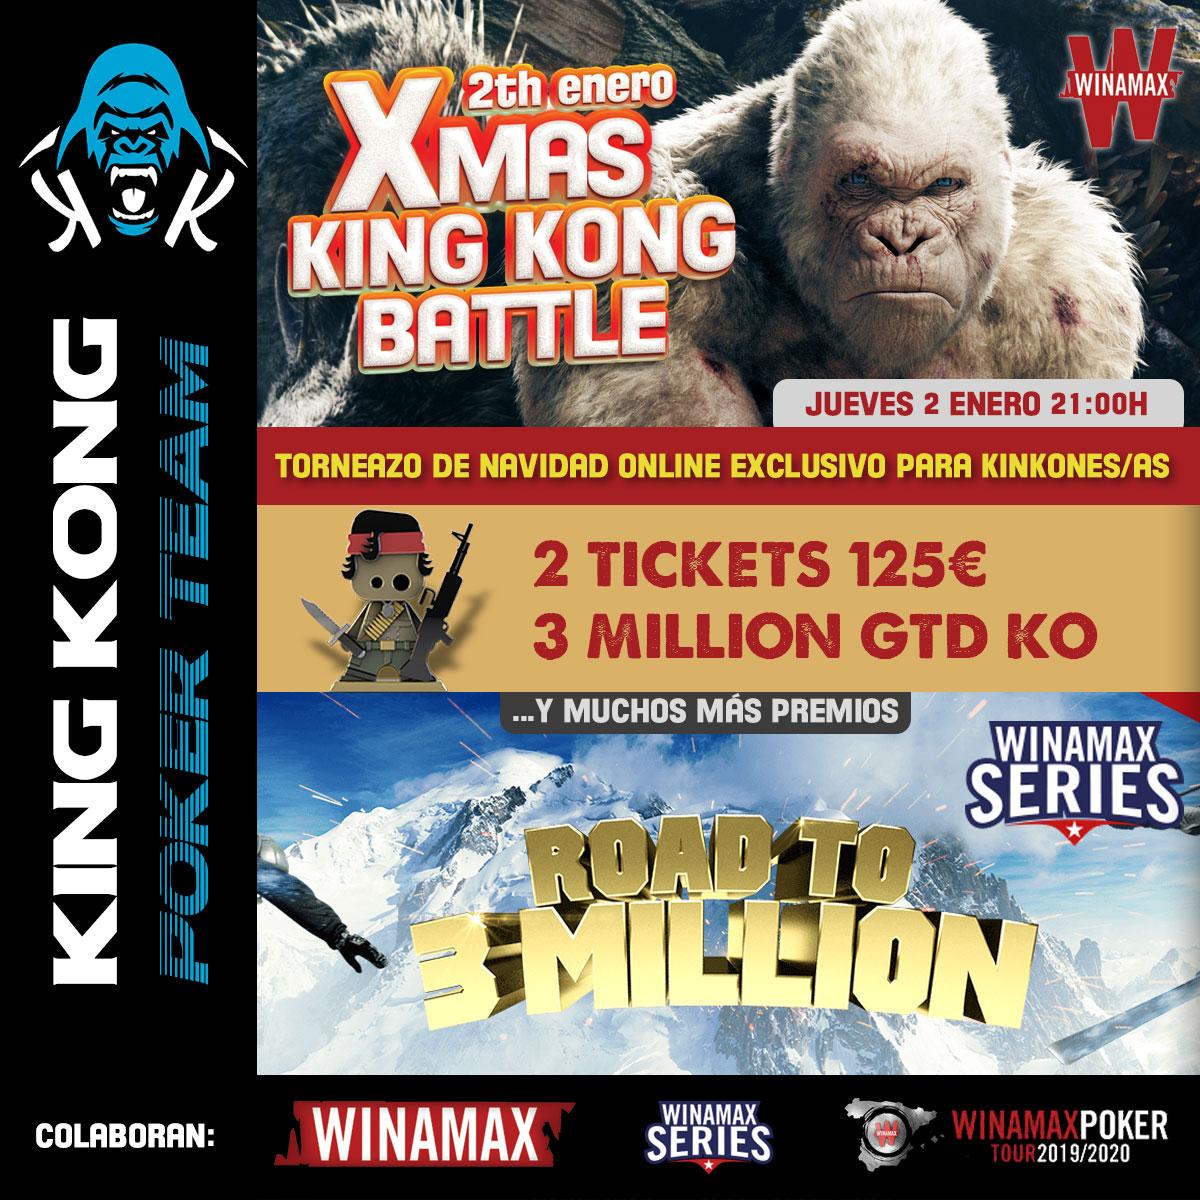 20181207_PROMO_XMAS_King_Kong_Battle_banner_millions_web